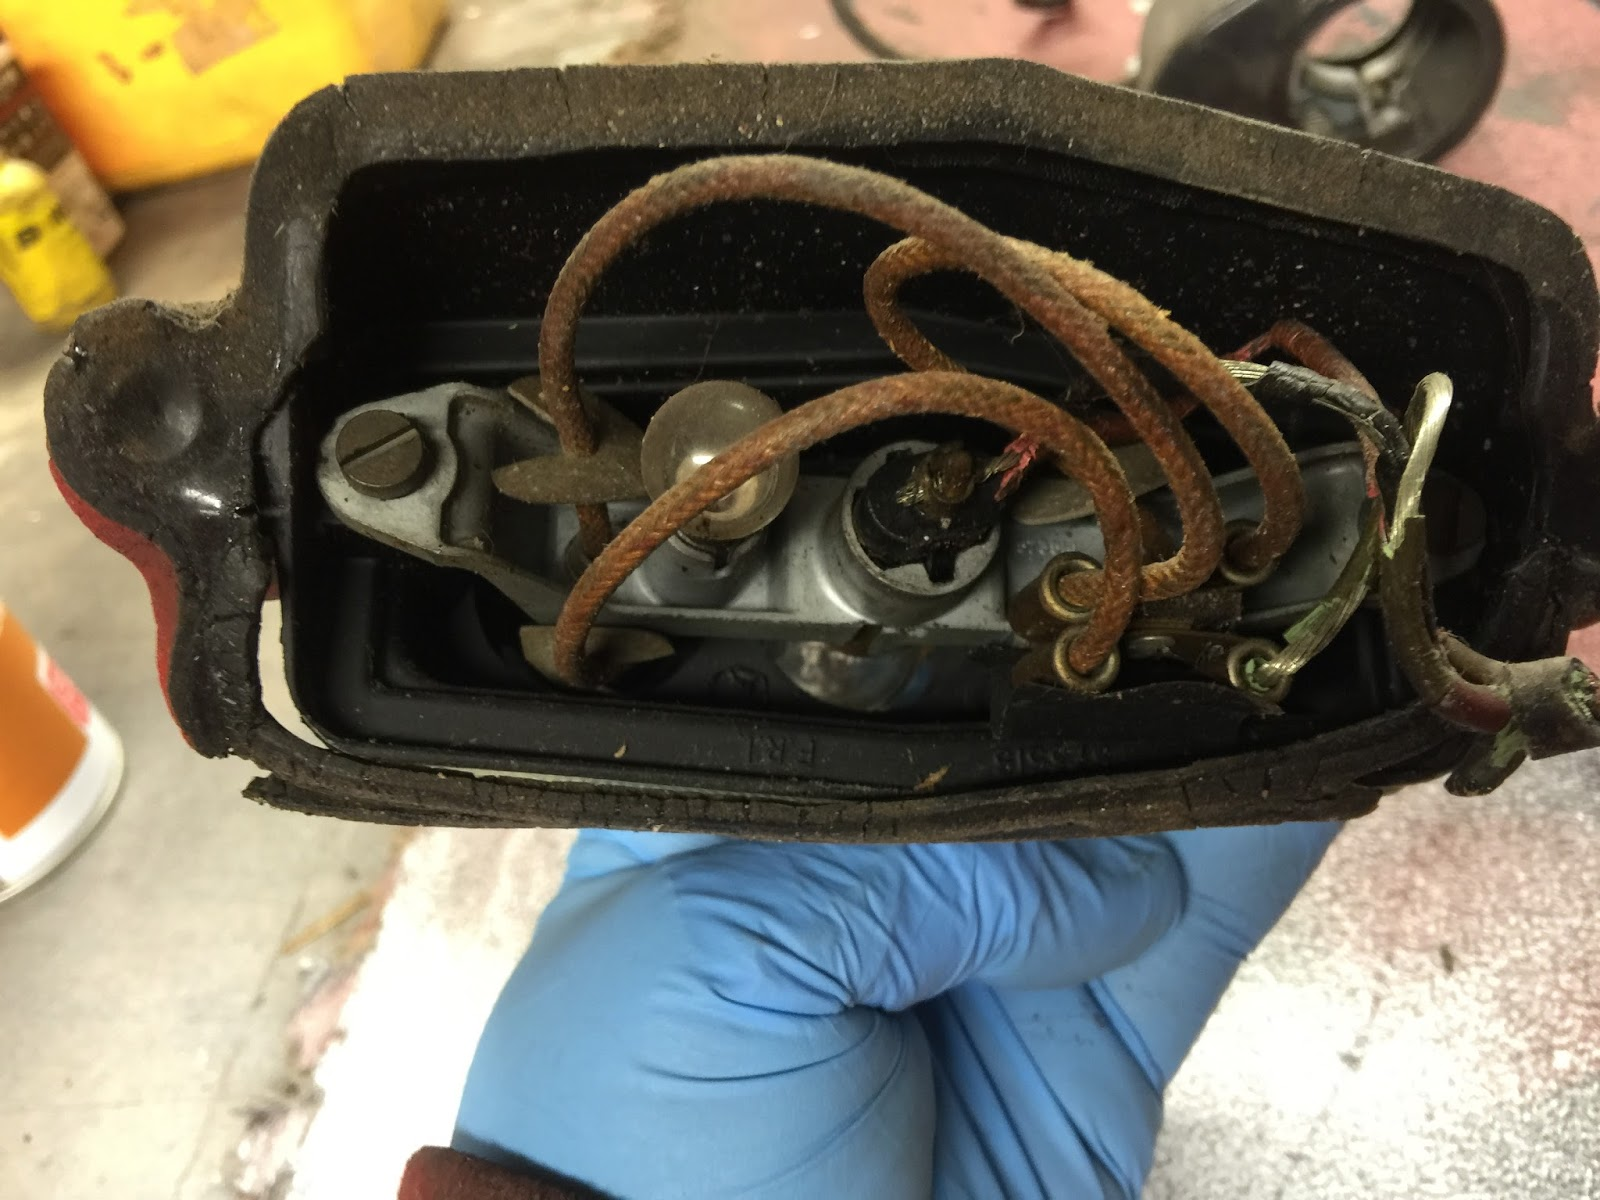 Jaguar Xk150 Electrics Ots Restoration Wiring Harness Lots Of Wires